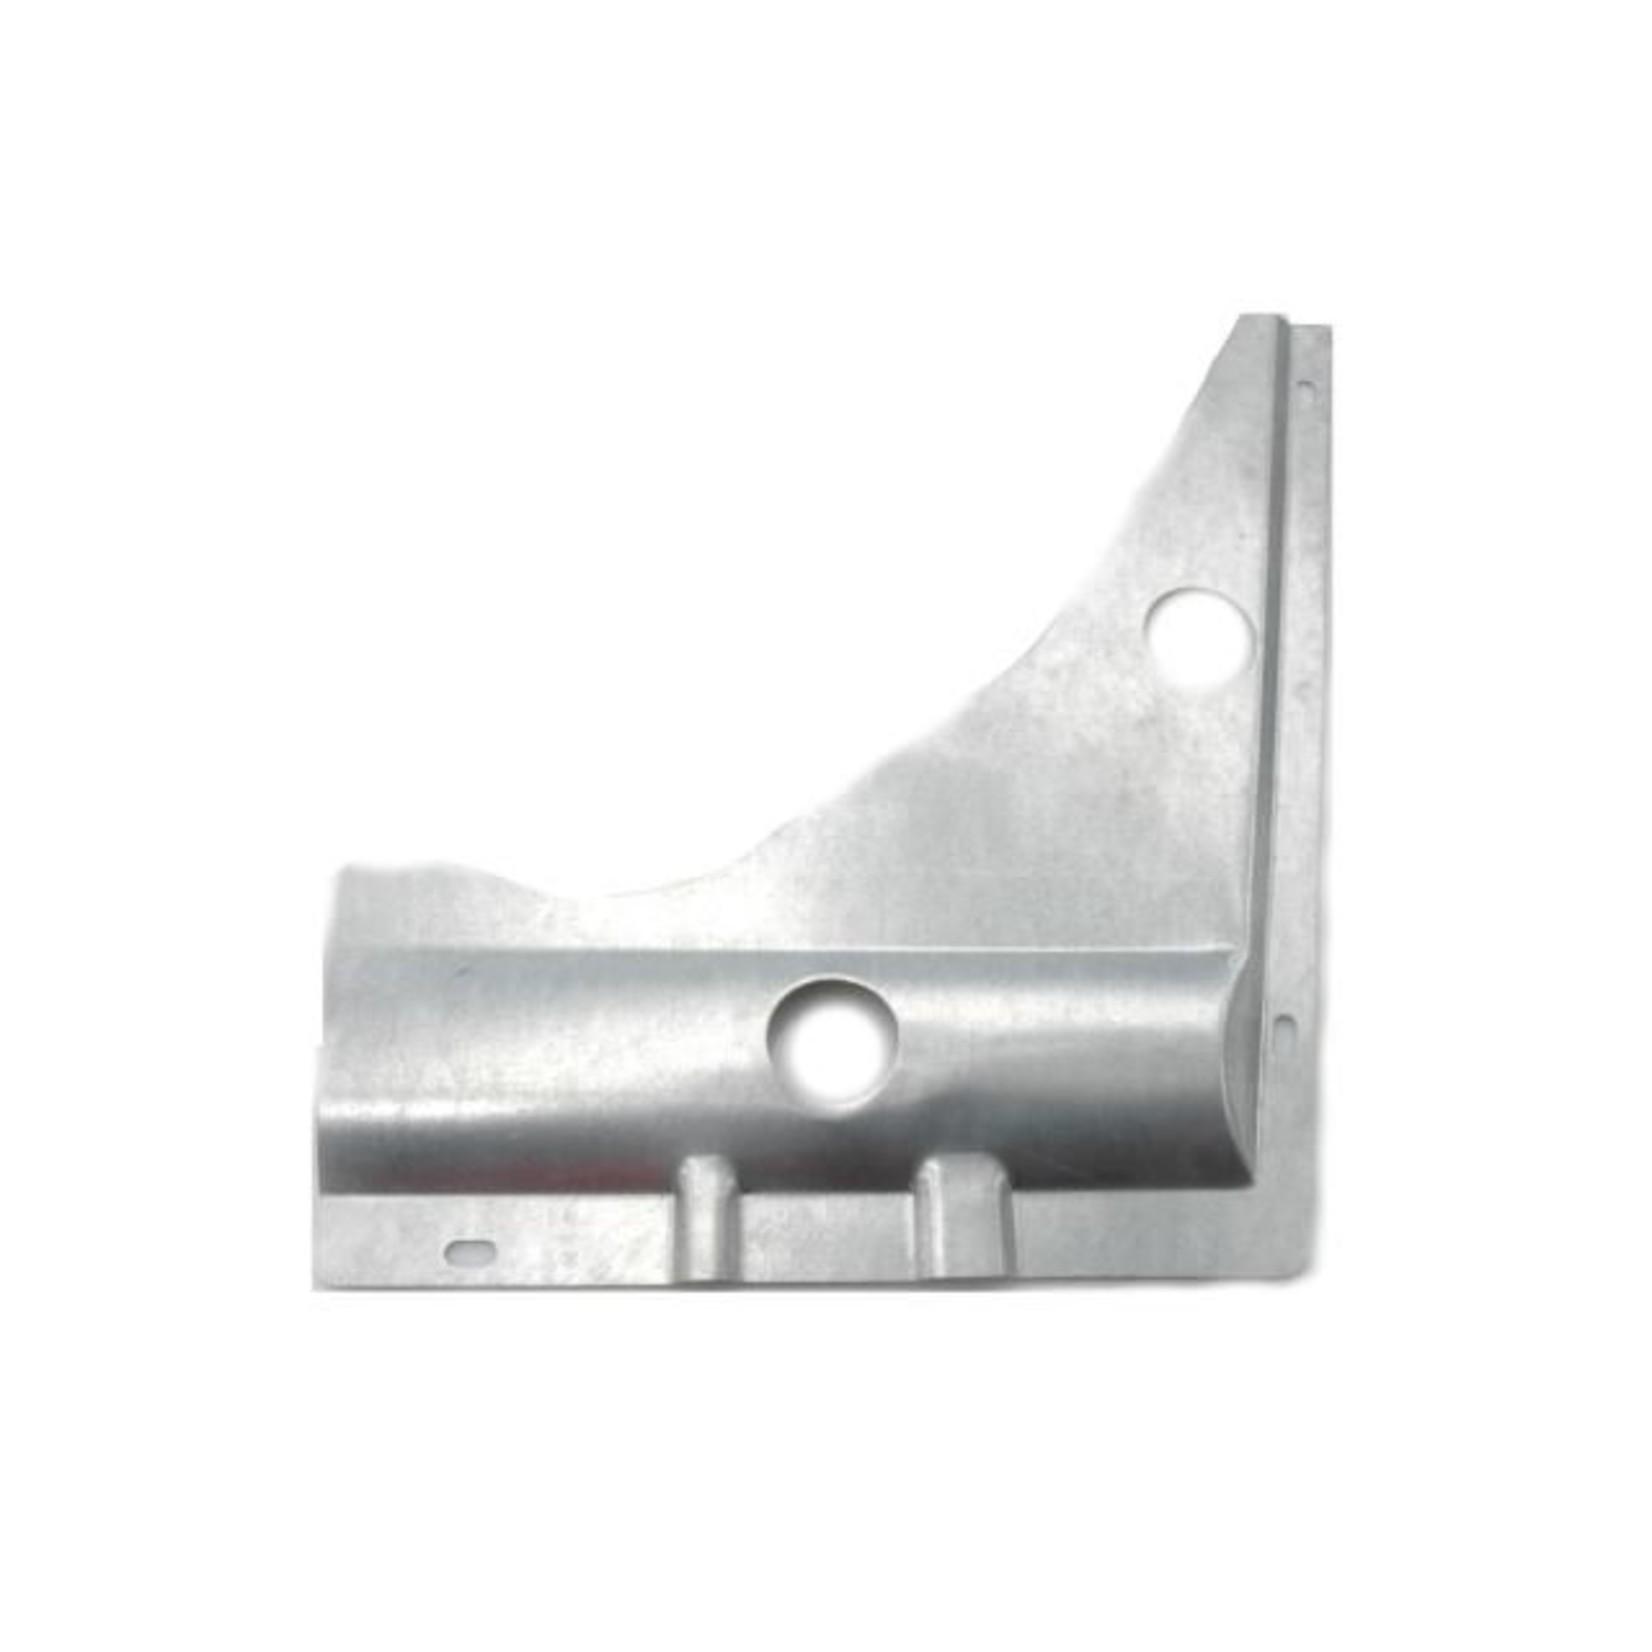 Lower shield inferior half axle right Nr Org: DX434107